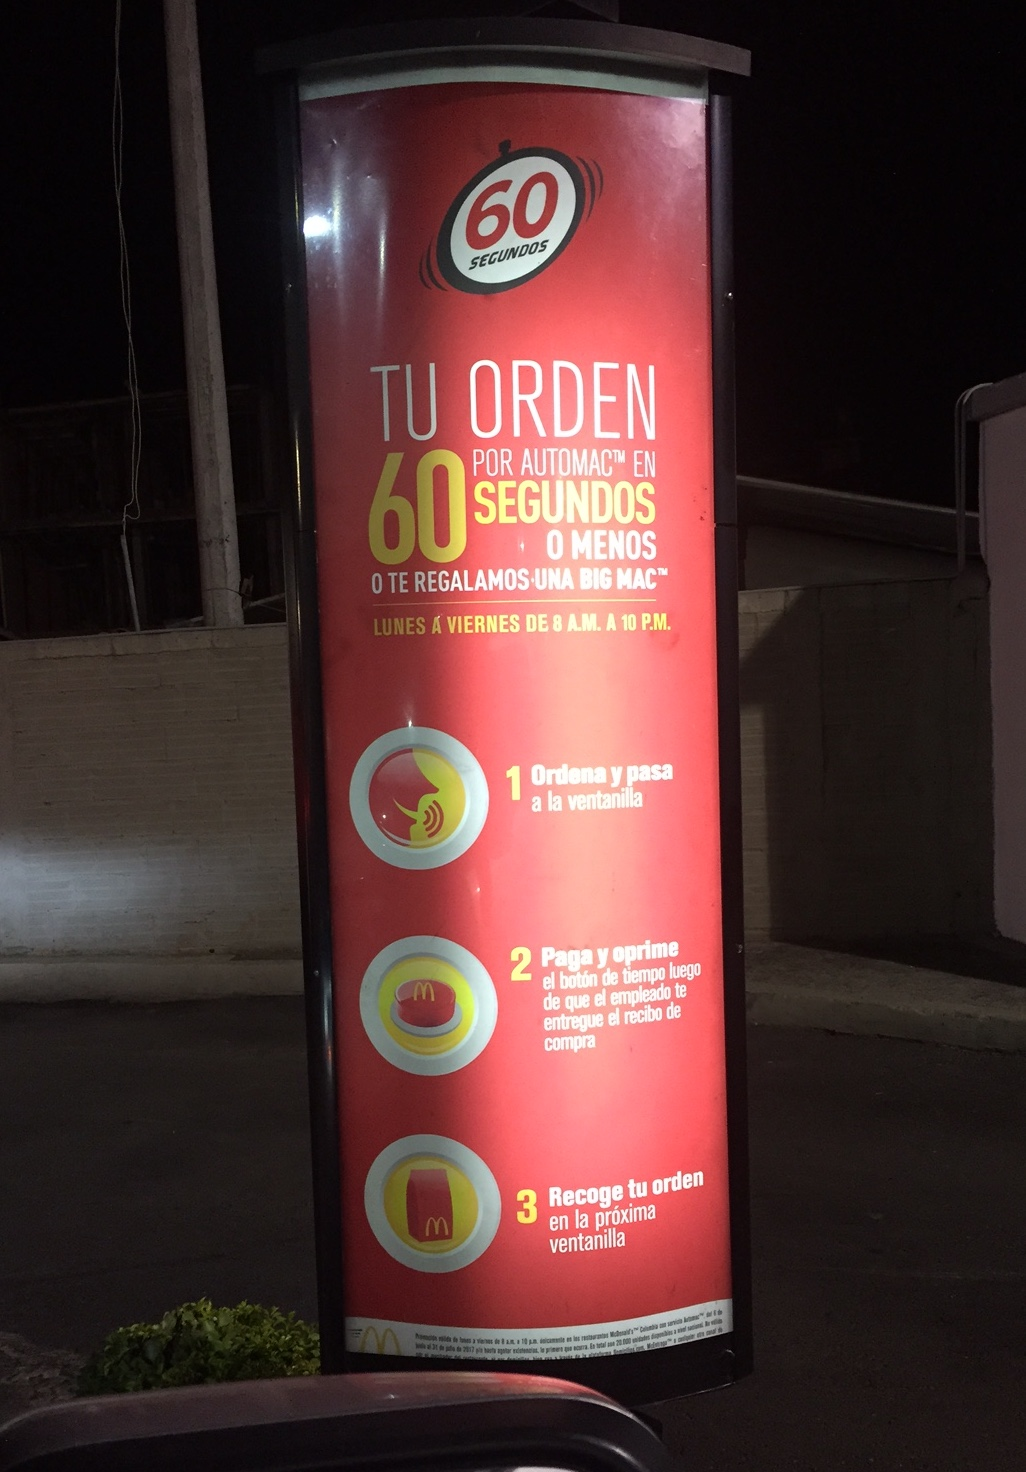 McDonalds promesa de servicio 60 segundos